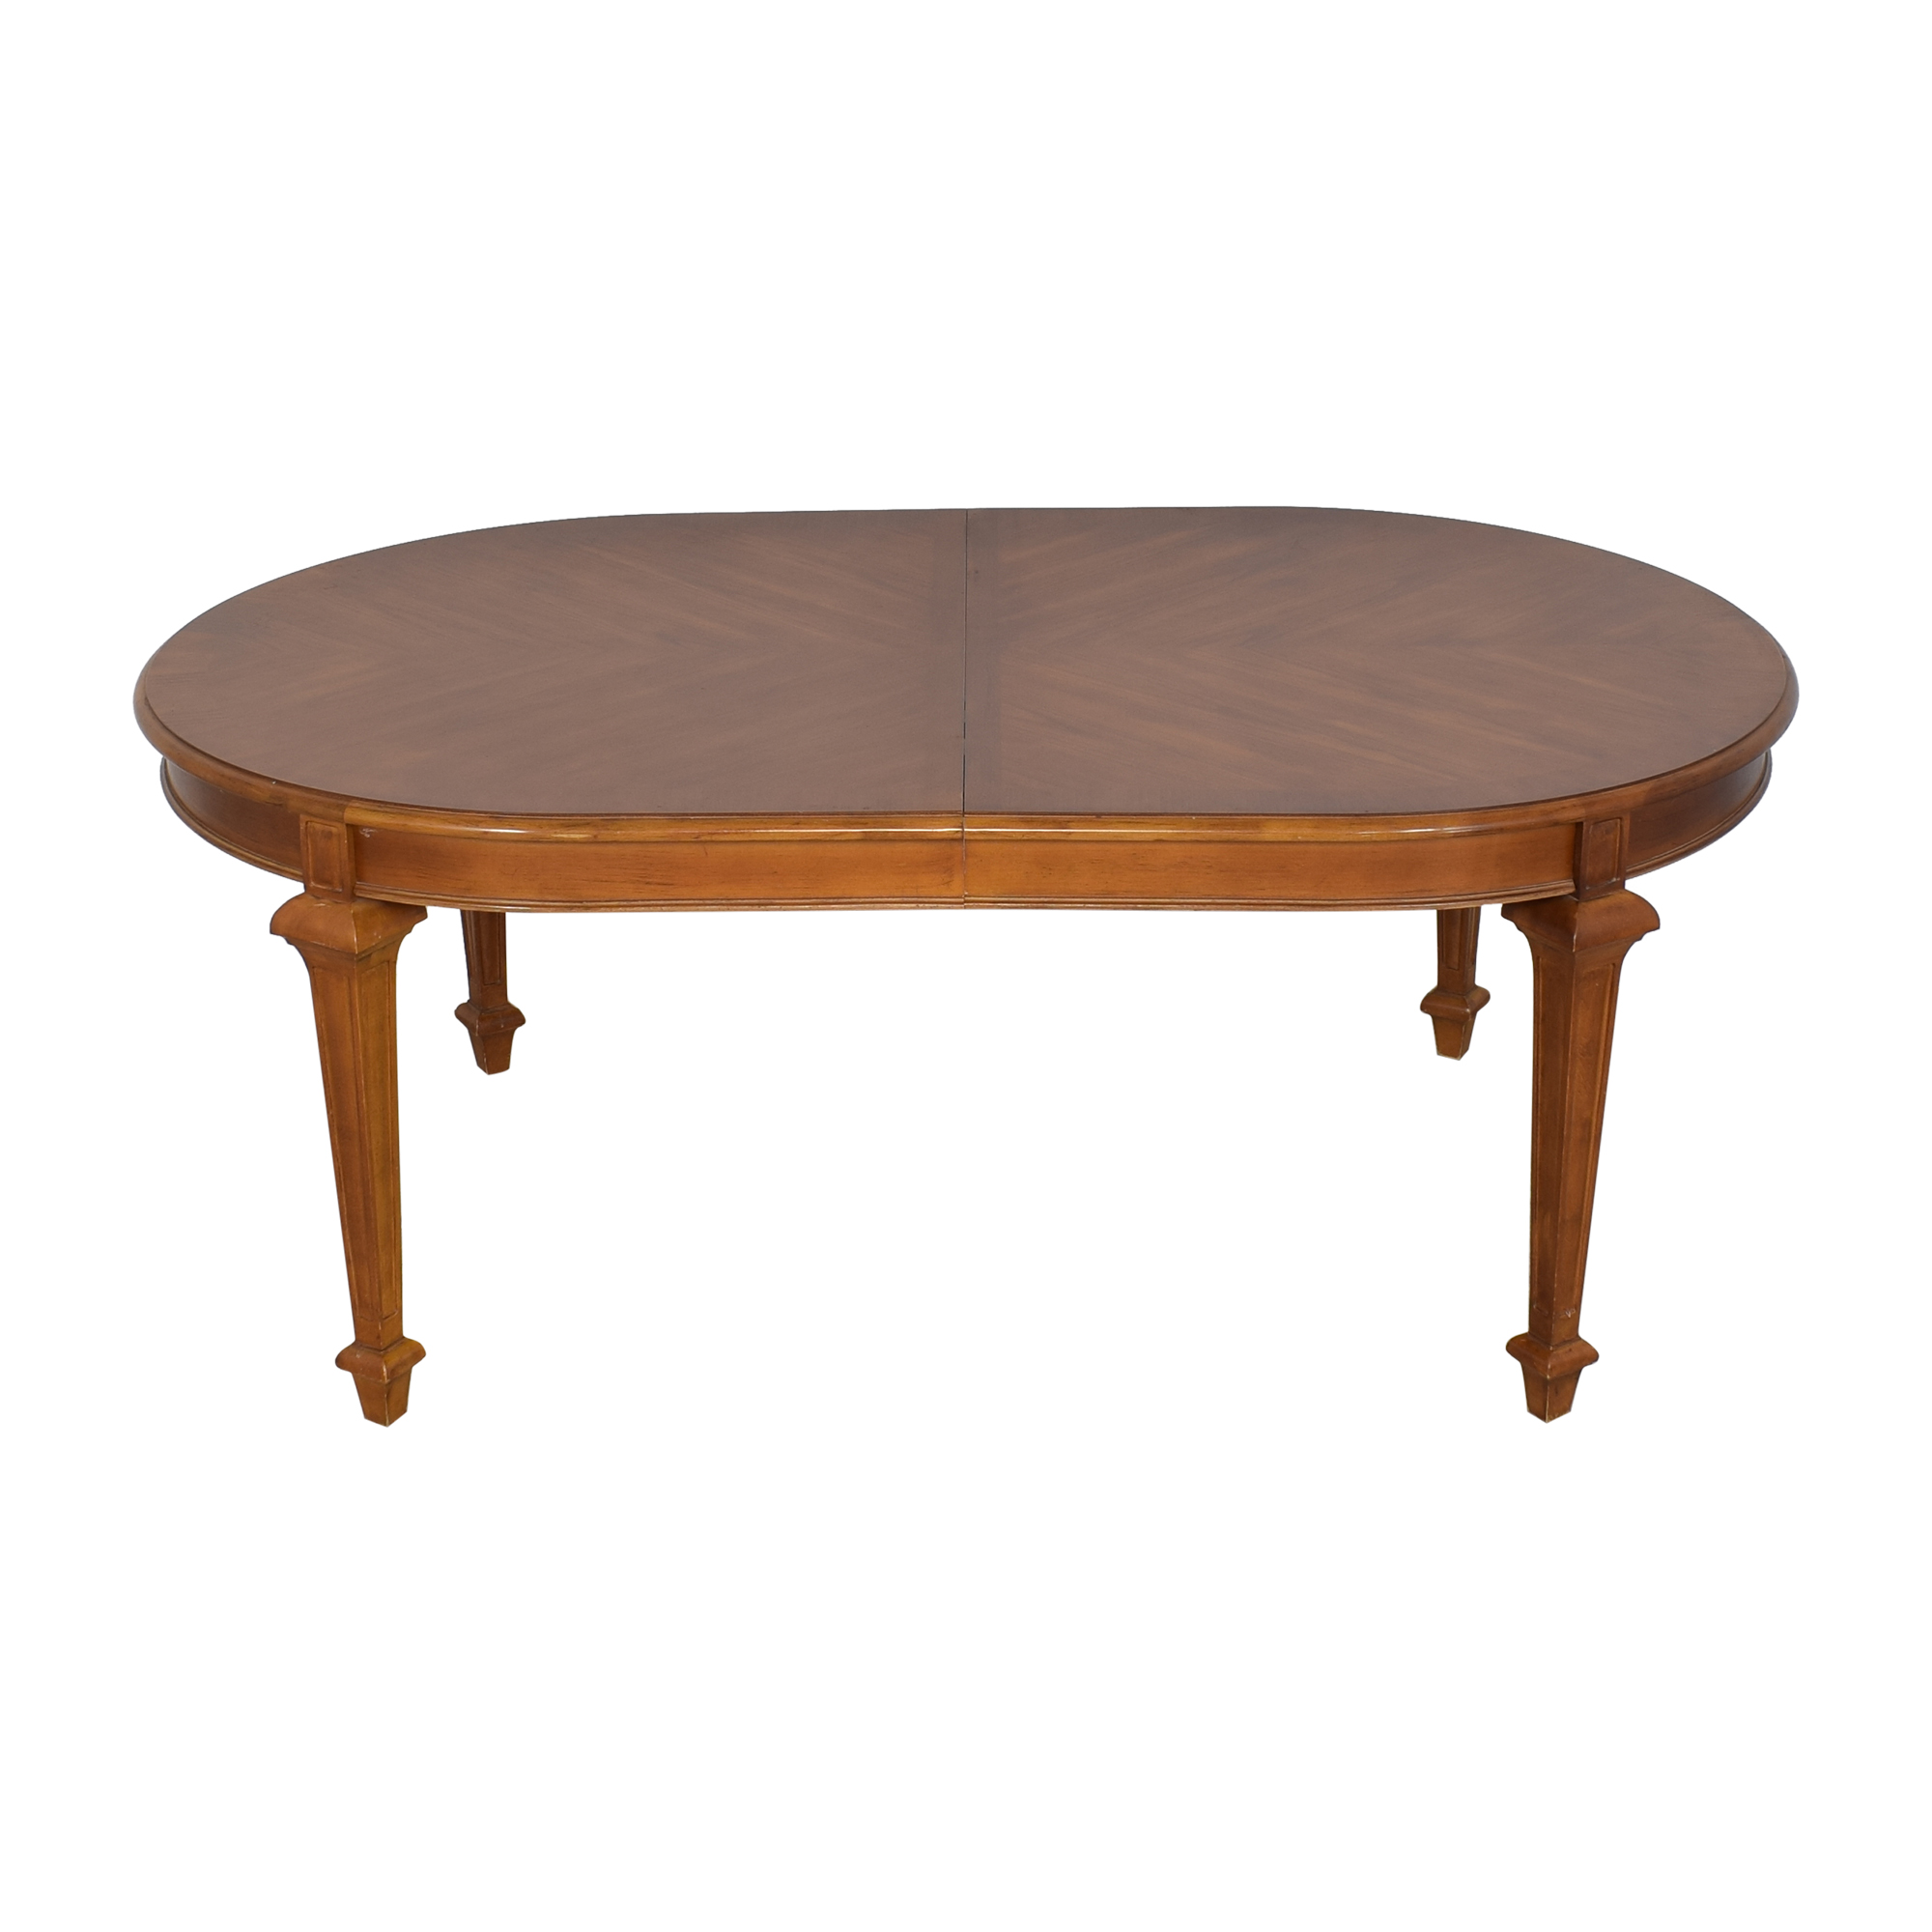 Bernhardt Extending Dining Table / Tables